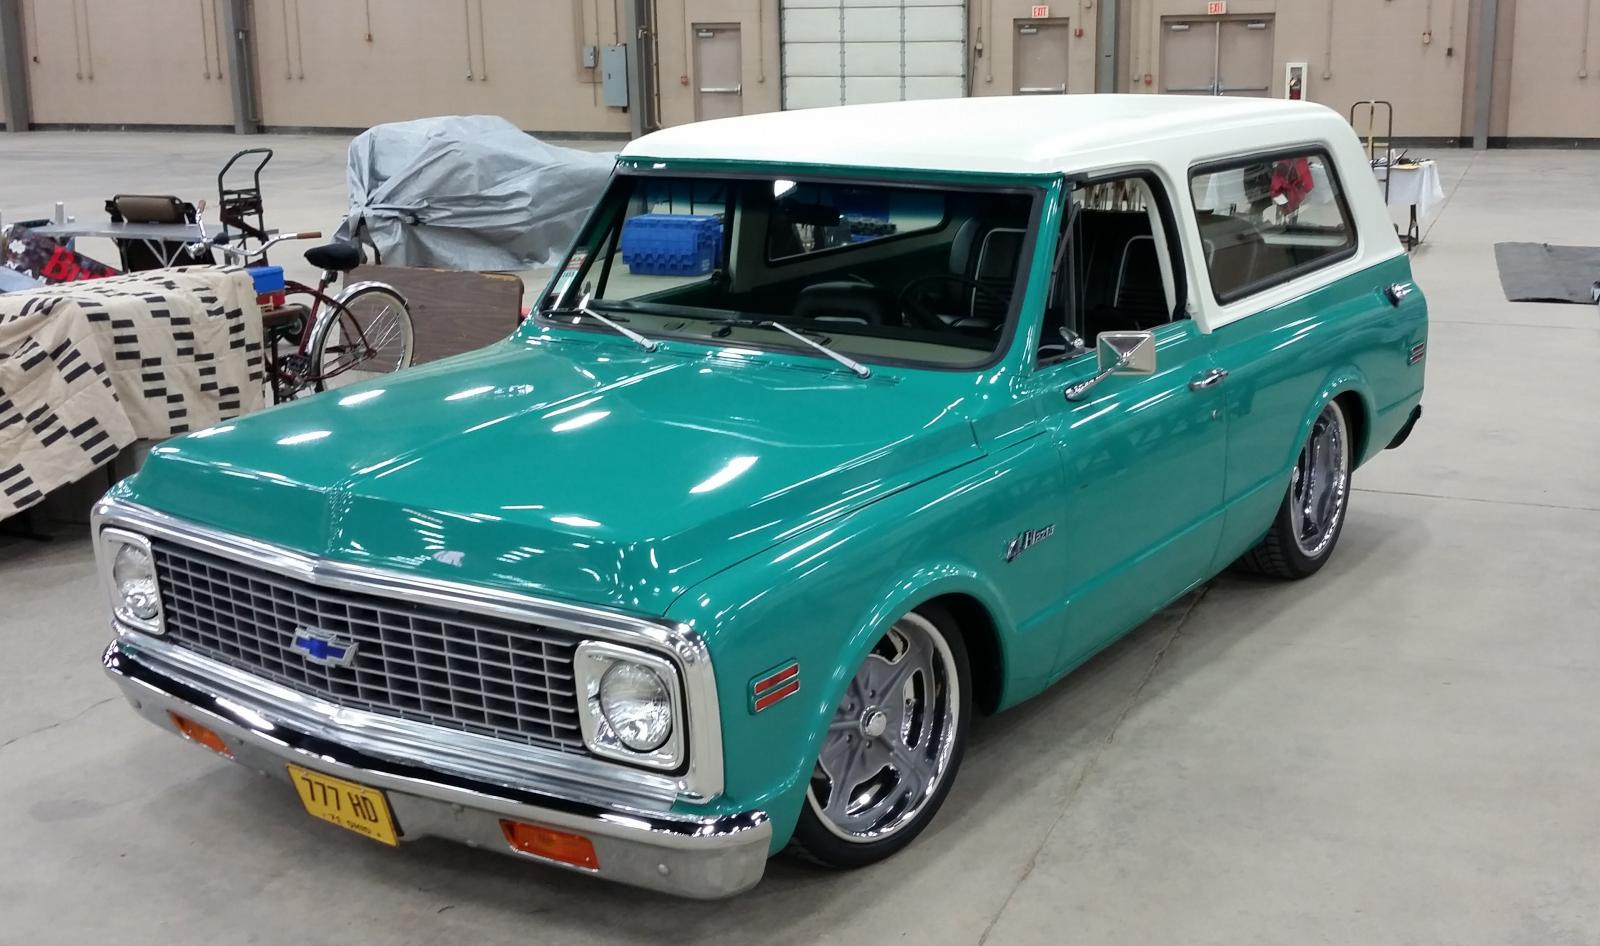 Chevy K5 Blazer For Sale >> 1971 Chevrolet K5 Blazer, 2wd, C-10, Short Bed, Pro ...